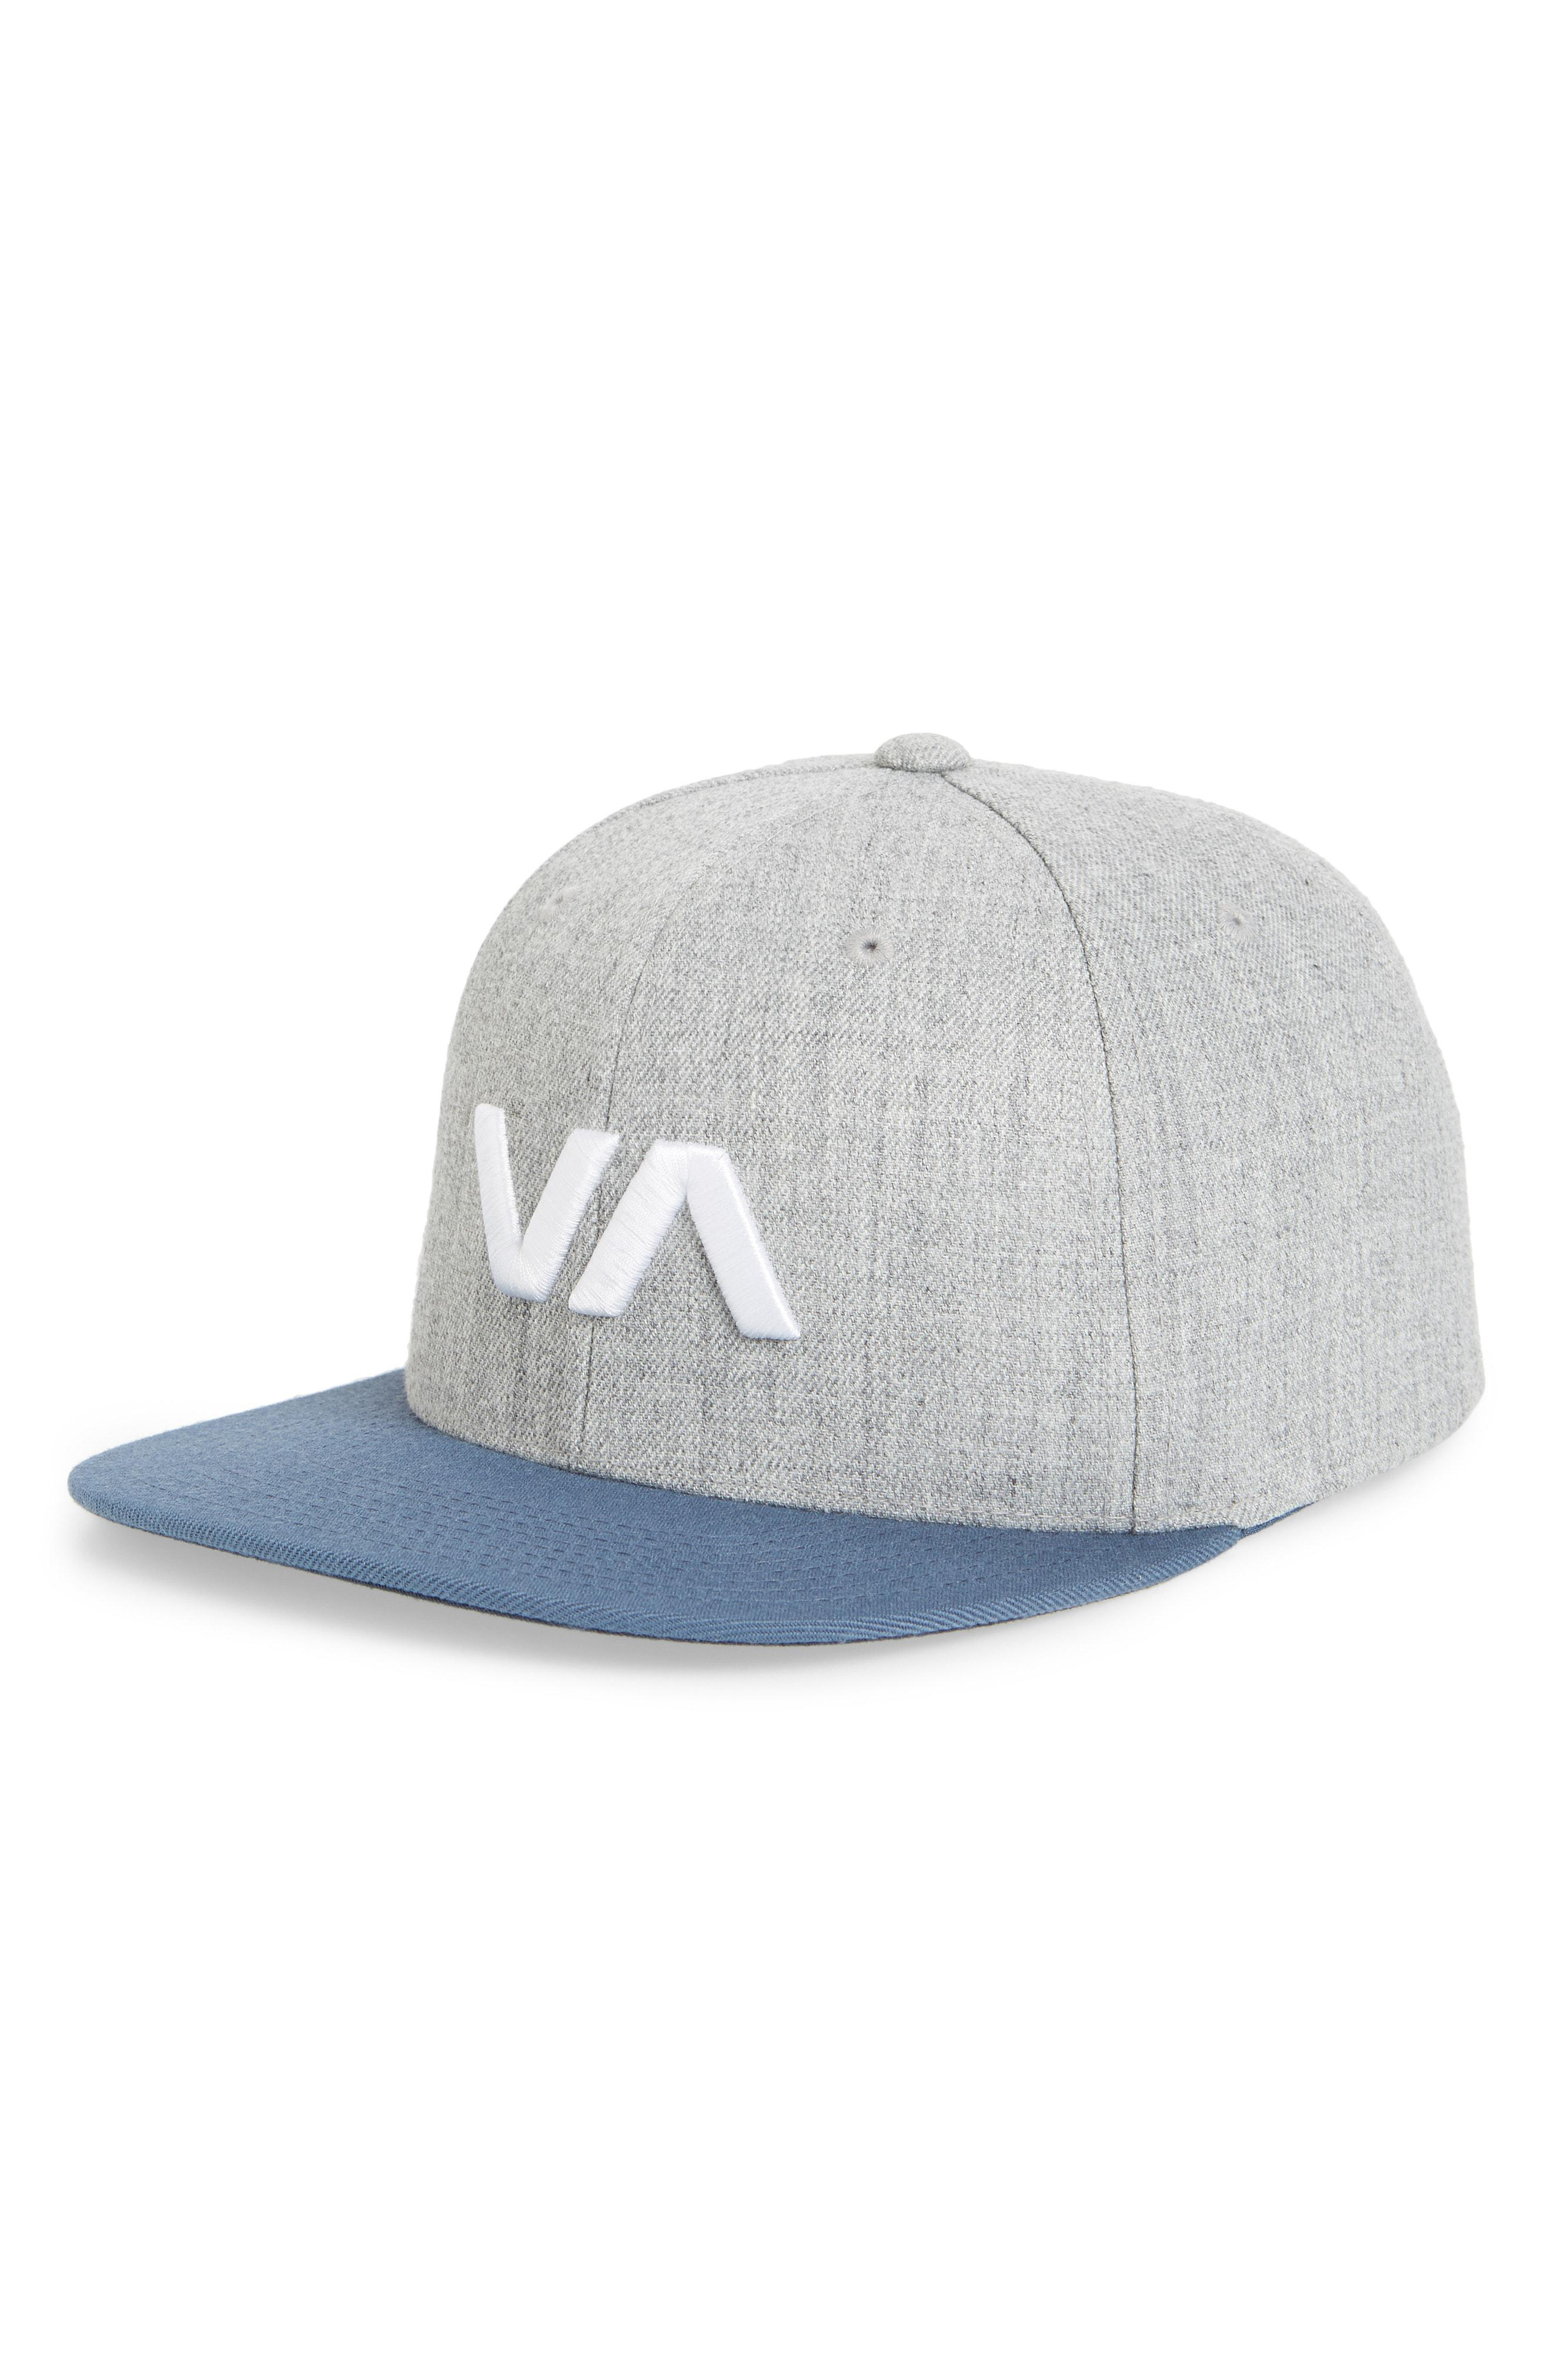 e1fe7097 Lyst - RVCA Va Snapback Ii Snapback Hat in Blue for Men